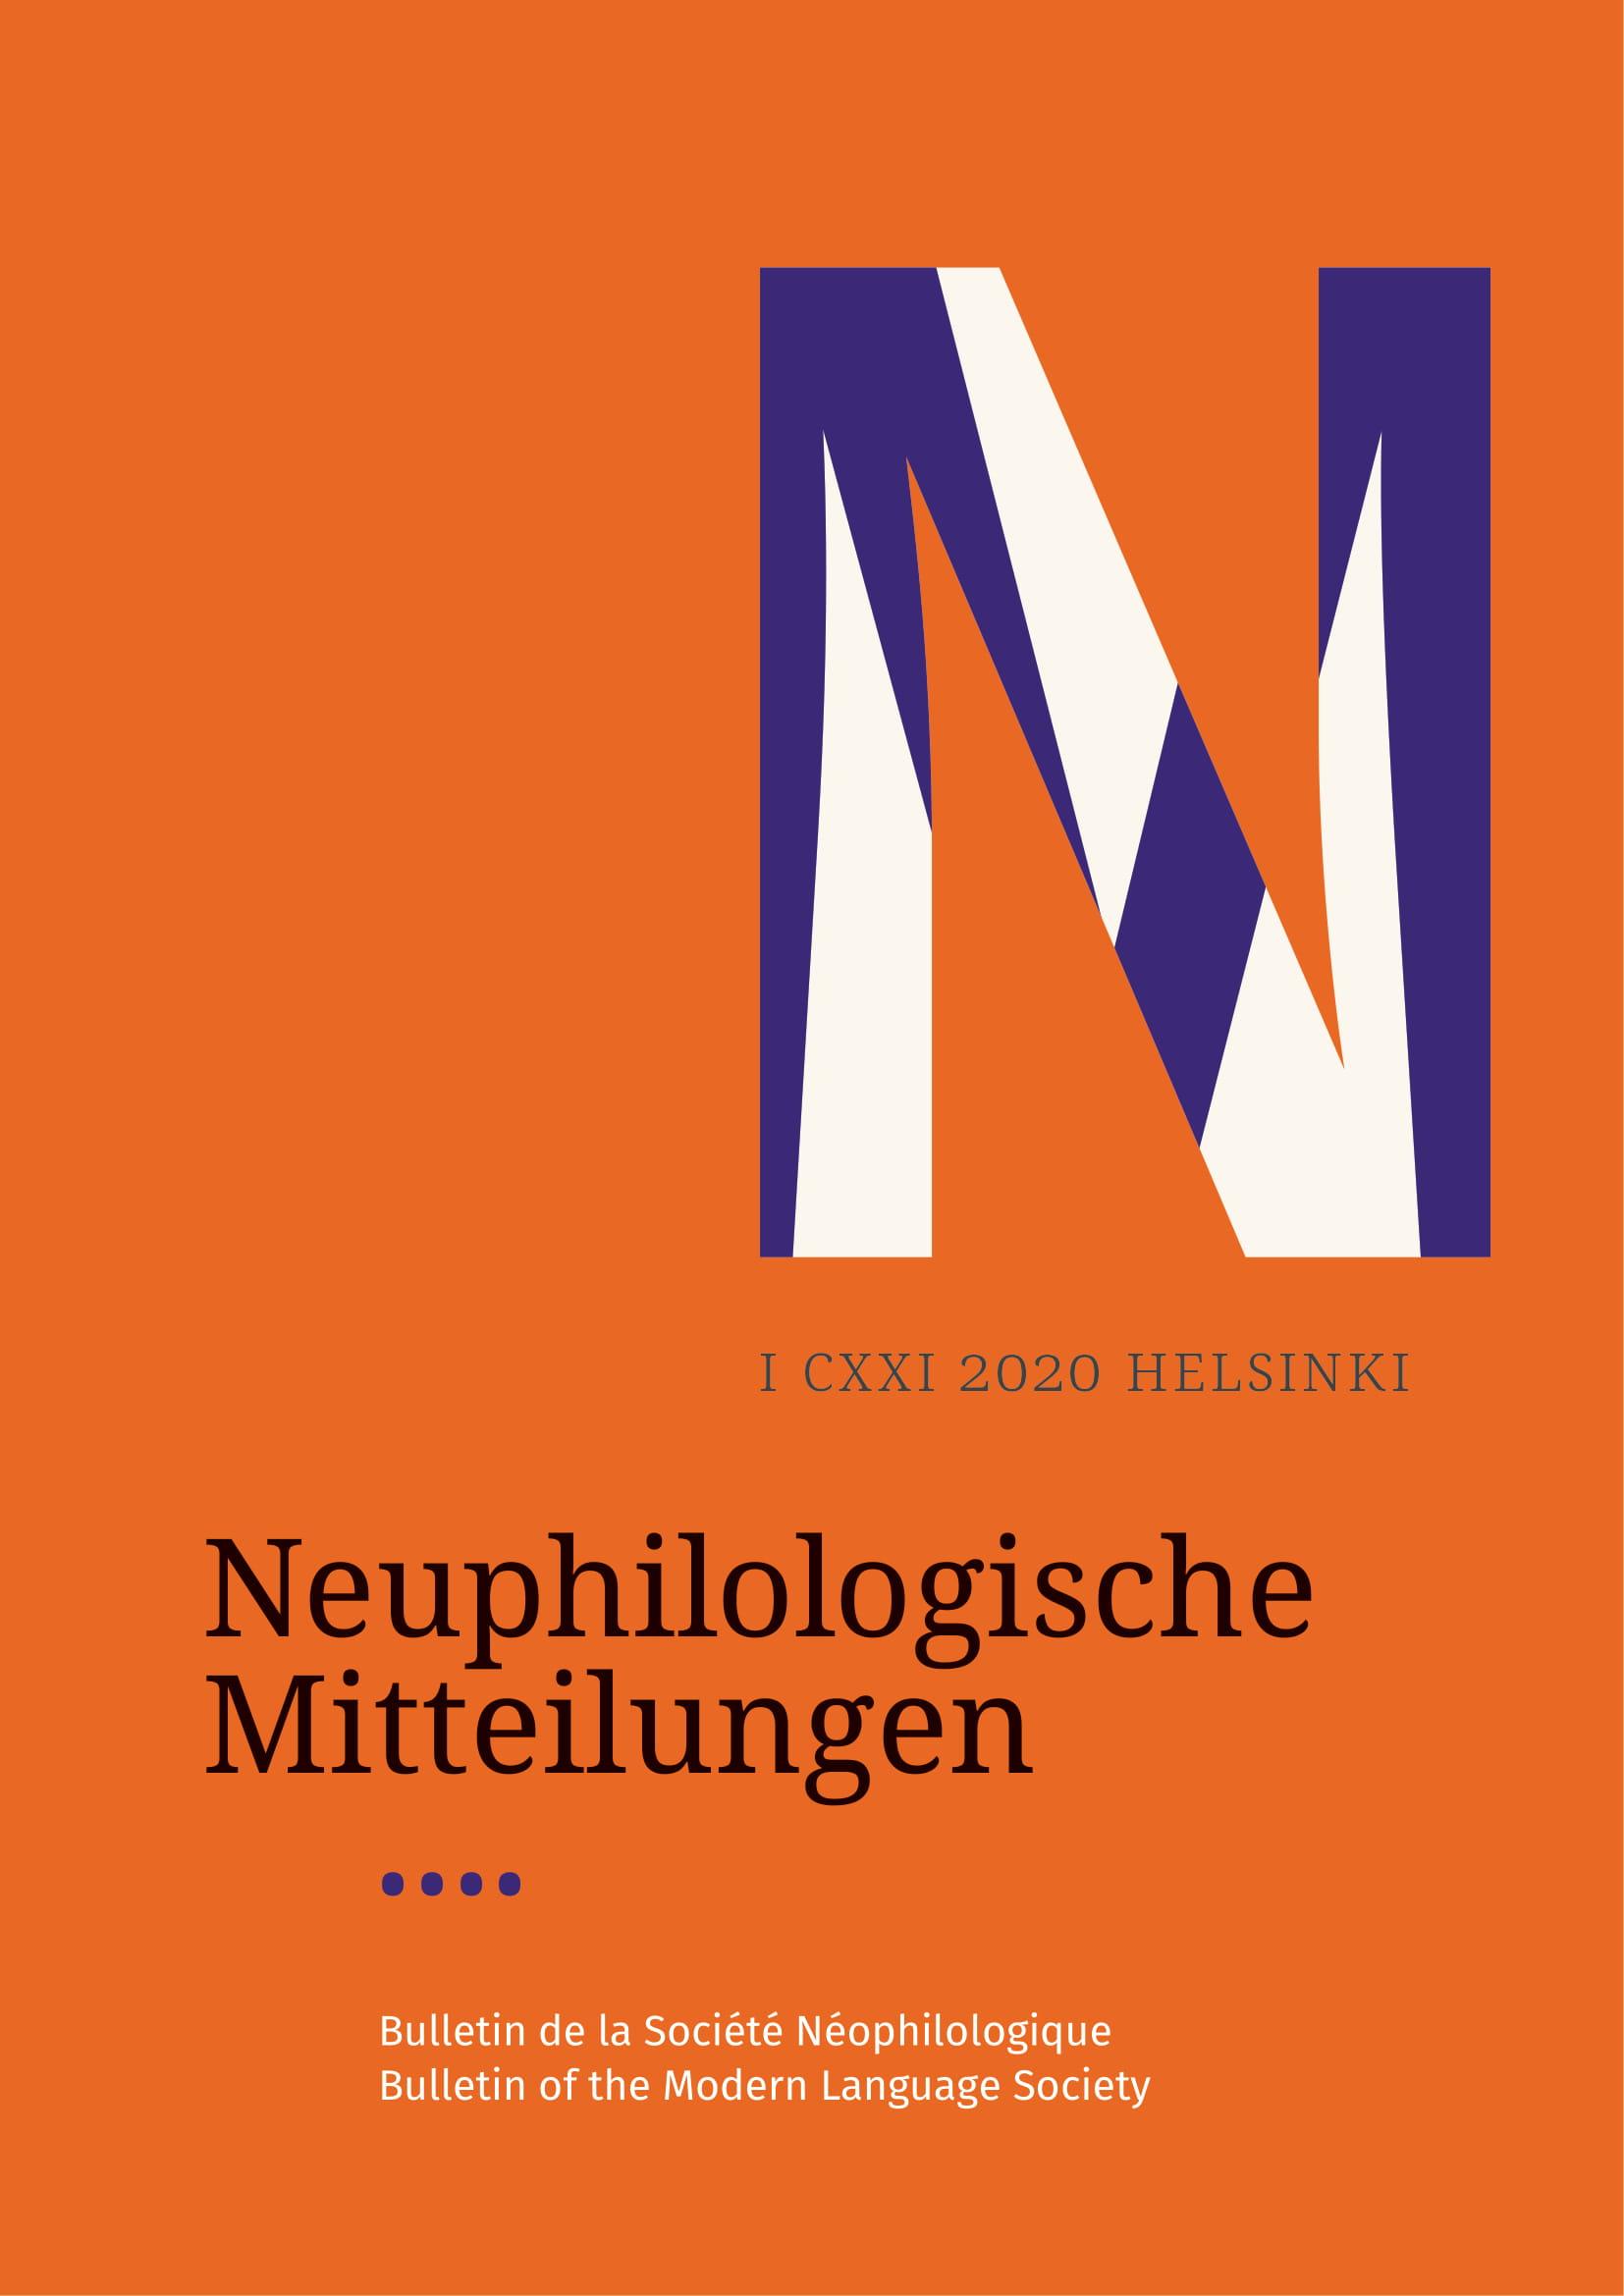 Vol 121 No 1 (2020)